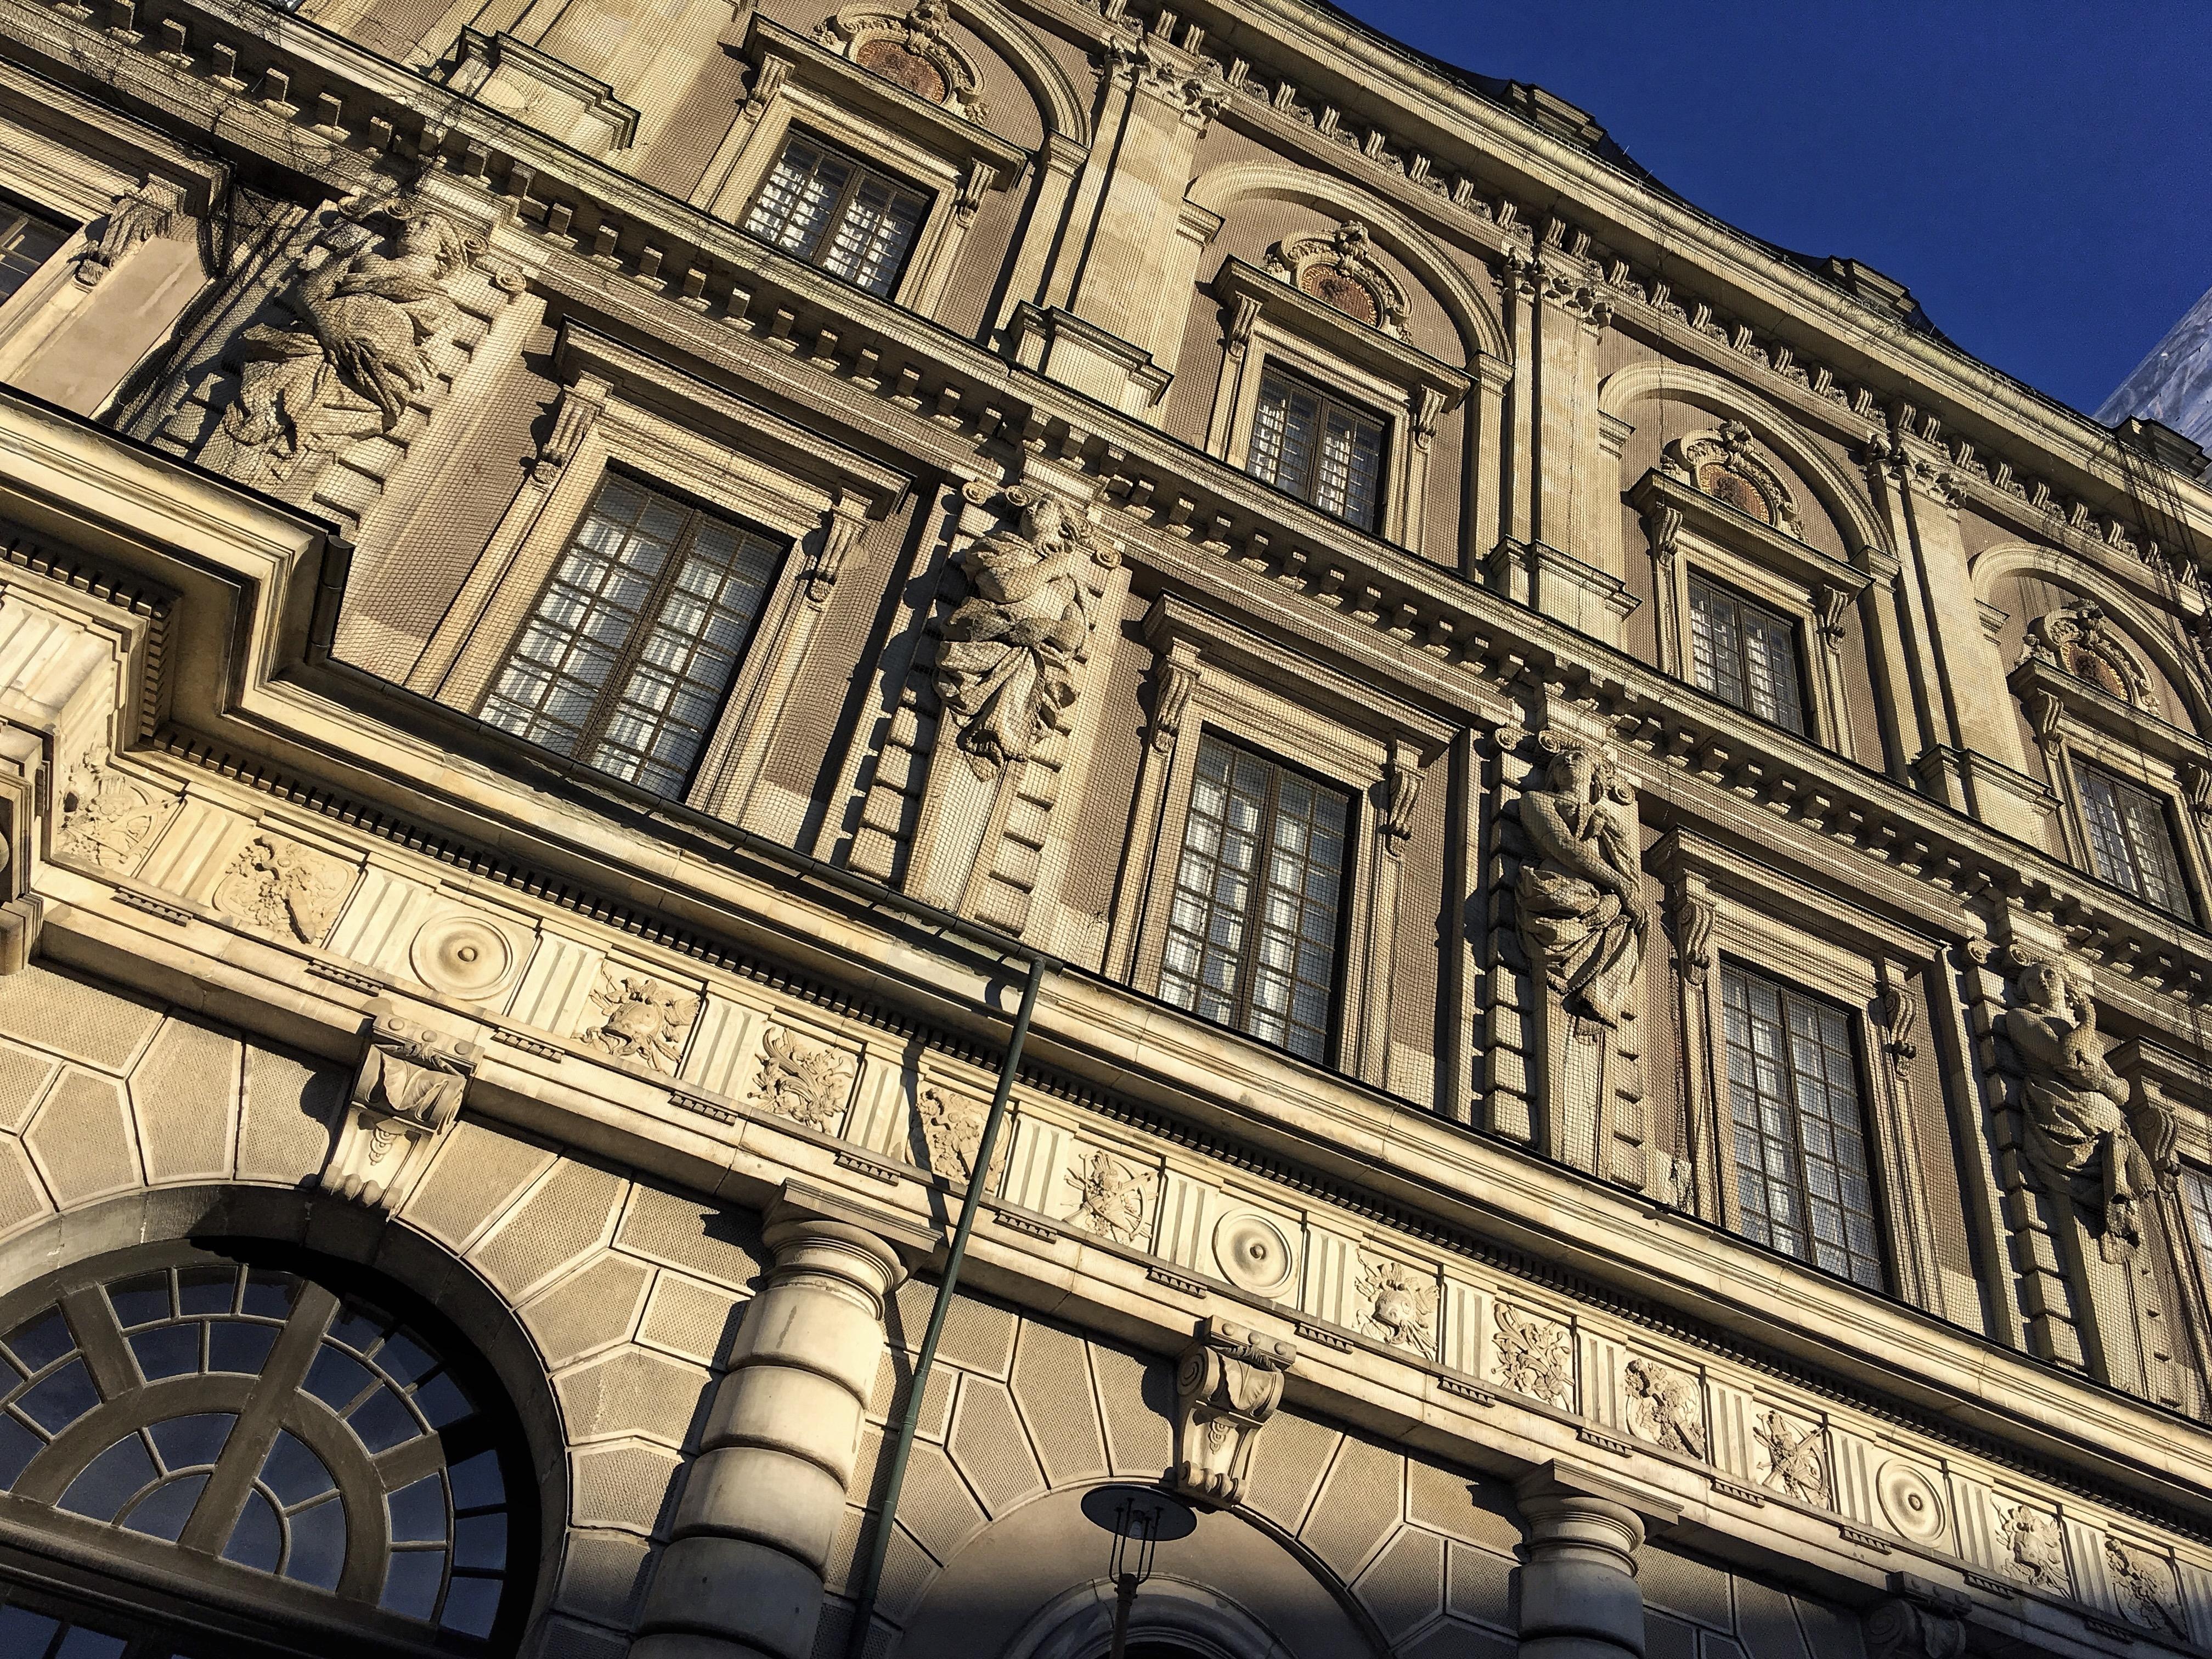 The Royal Palace, Architecture, Scandinavia, Window, Travel, HQ Photo